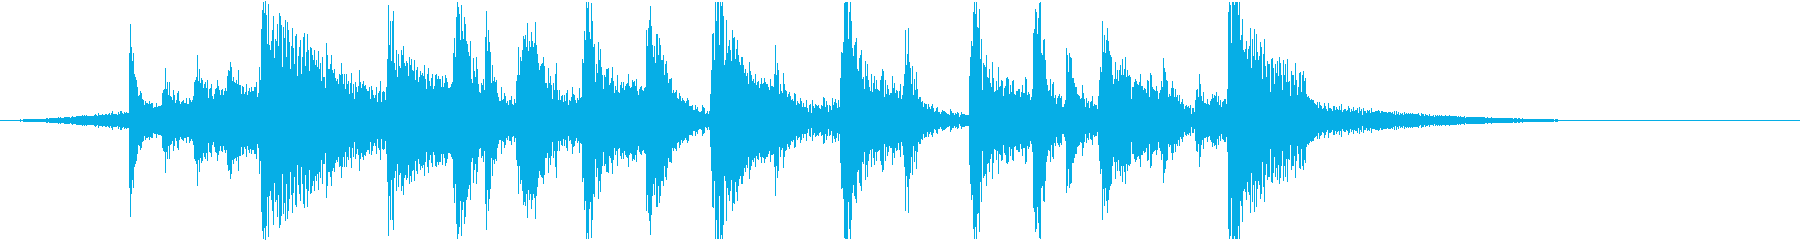 (˙꒳˙ᐢ)✋アニメのアイキャッチ3✋の再生済みの波形